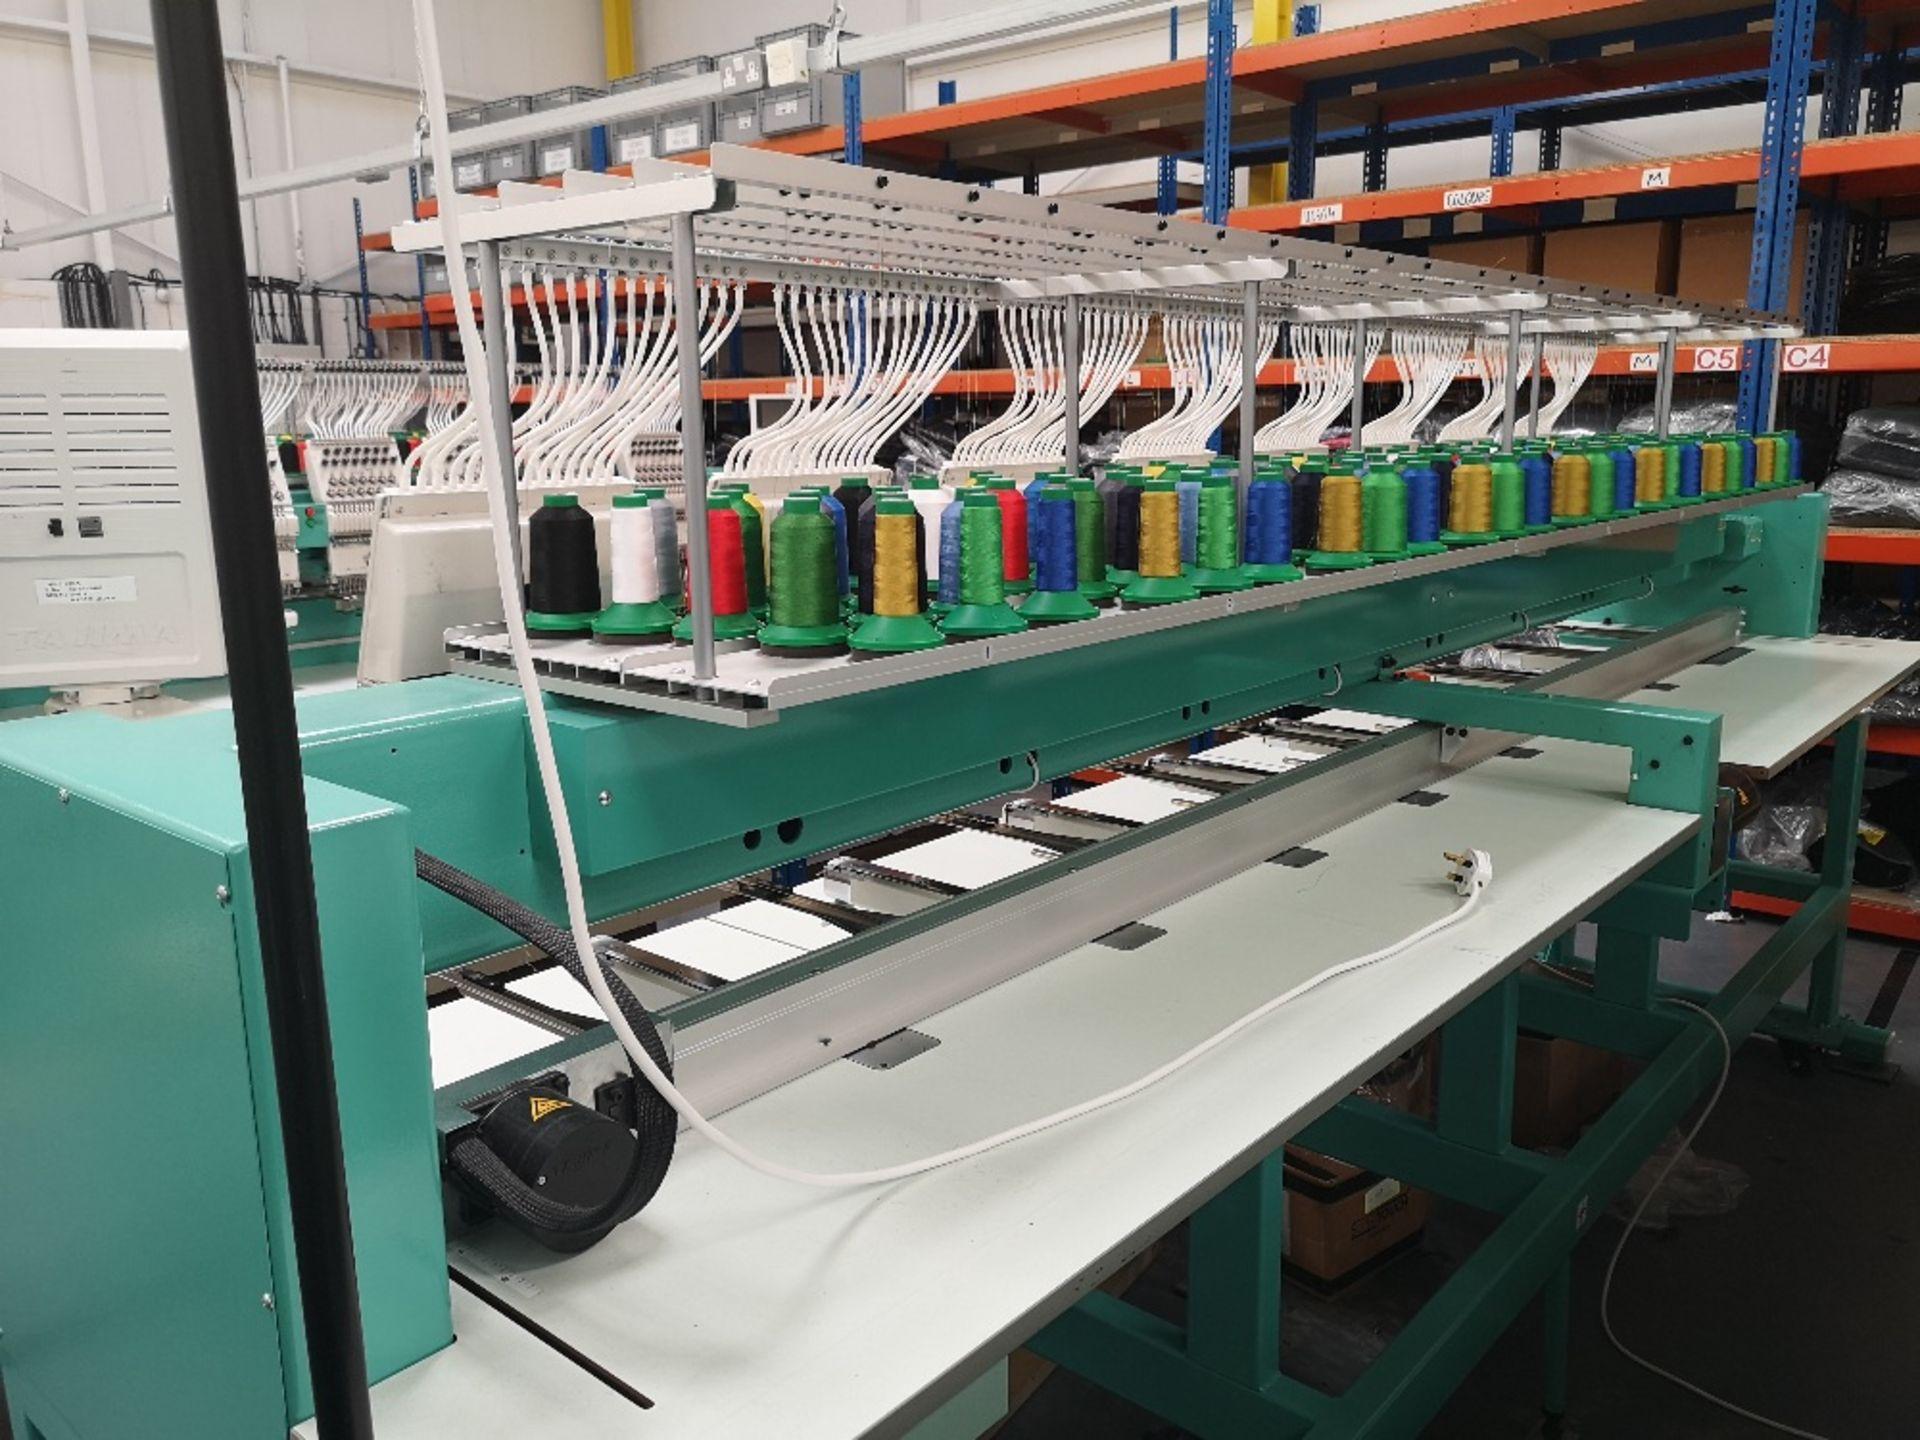 Tajima TFMX-II C1508 Electronic Multi Head Automatic Embroidery Machine (2017) - Image 4 of 12